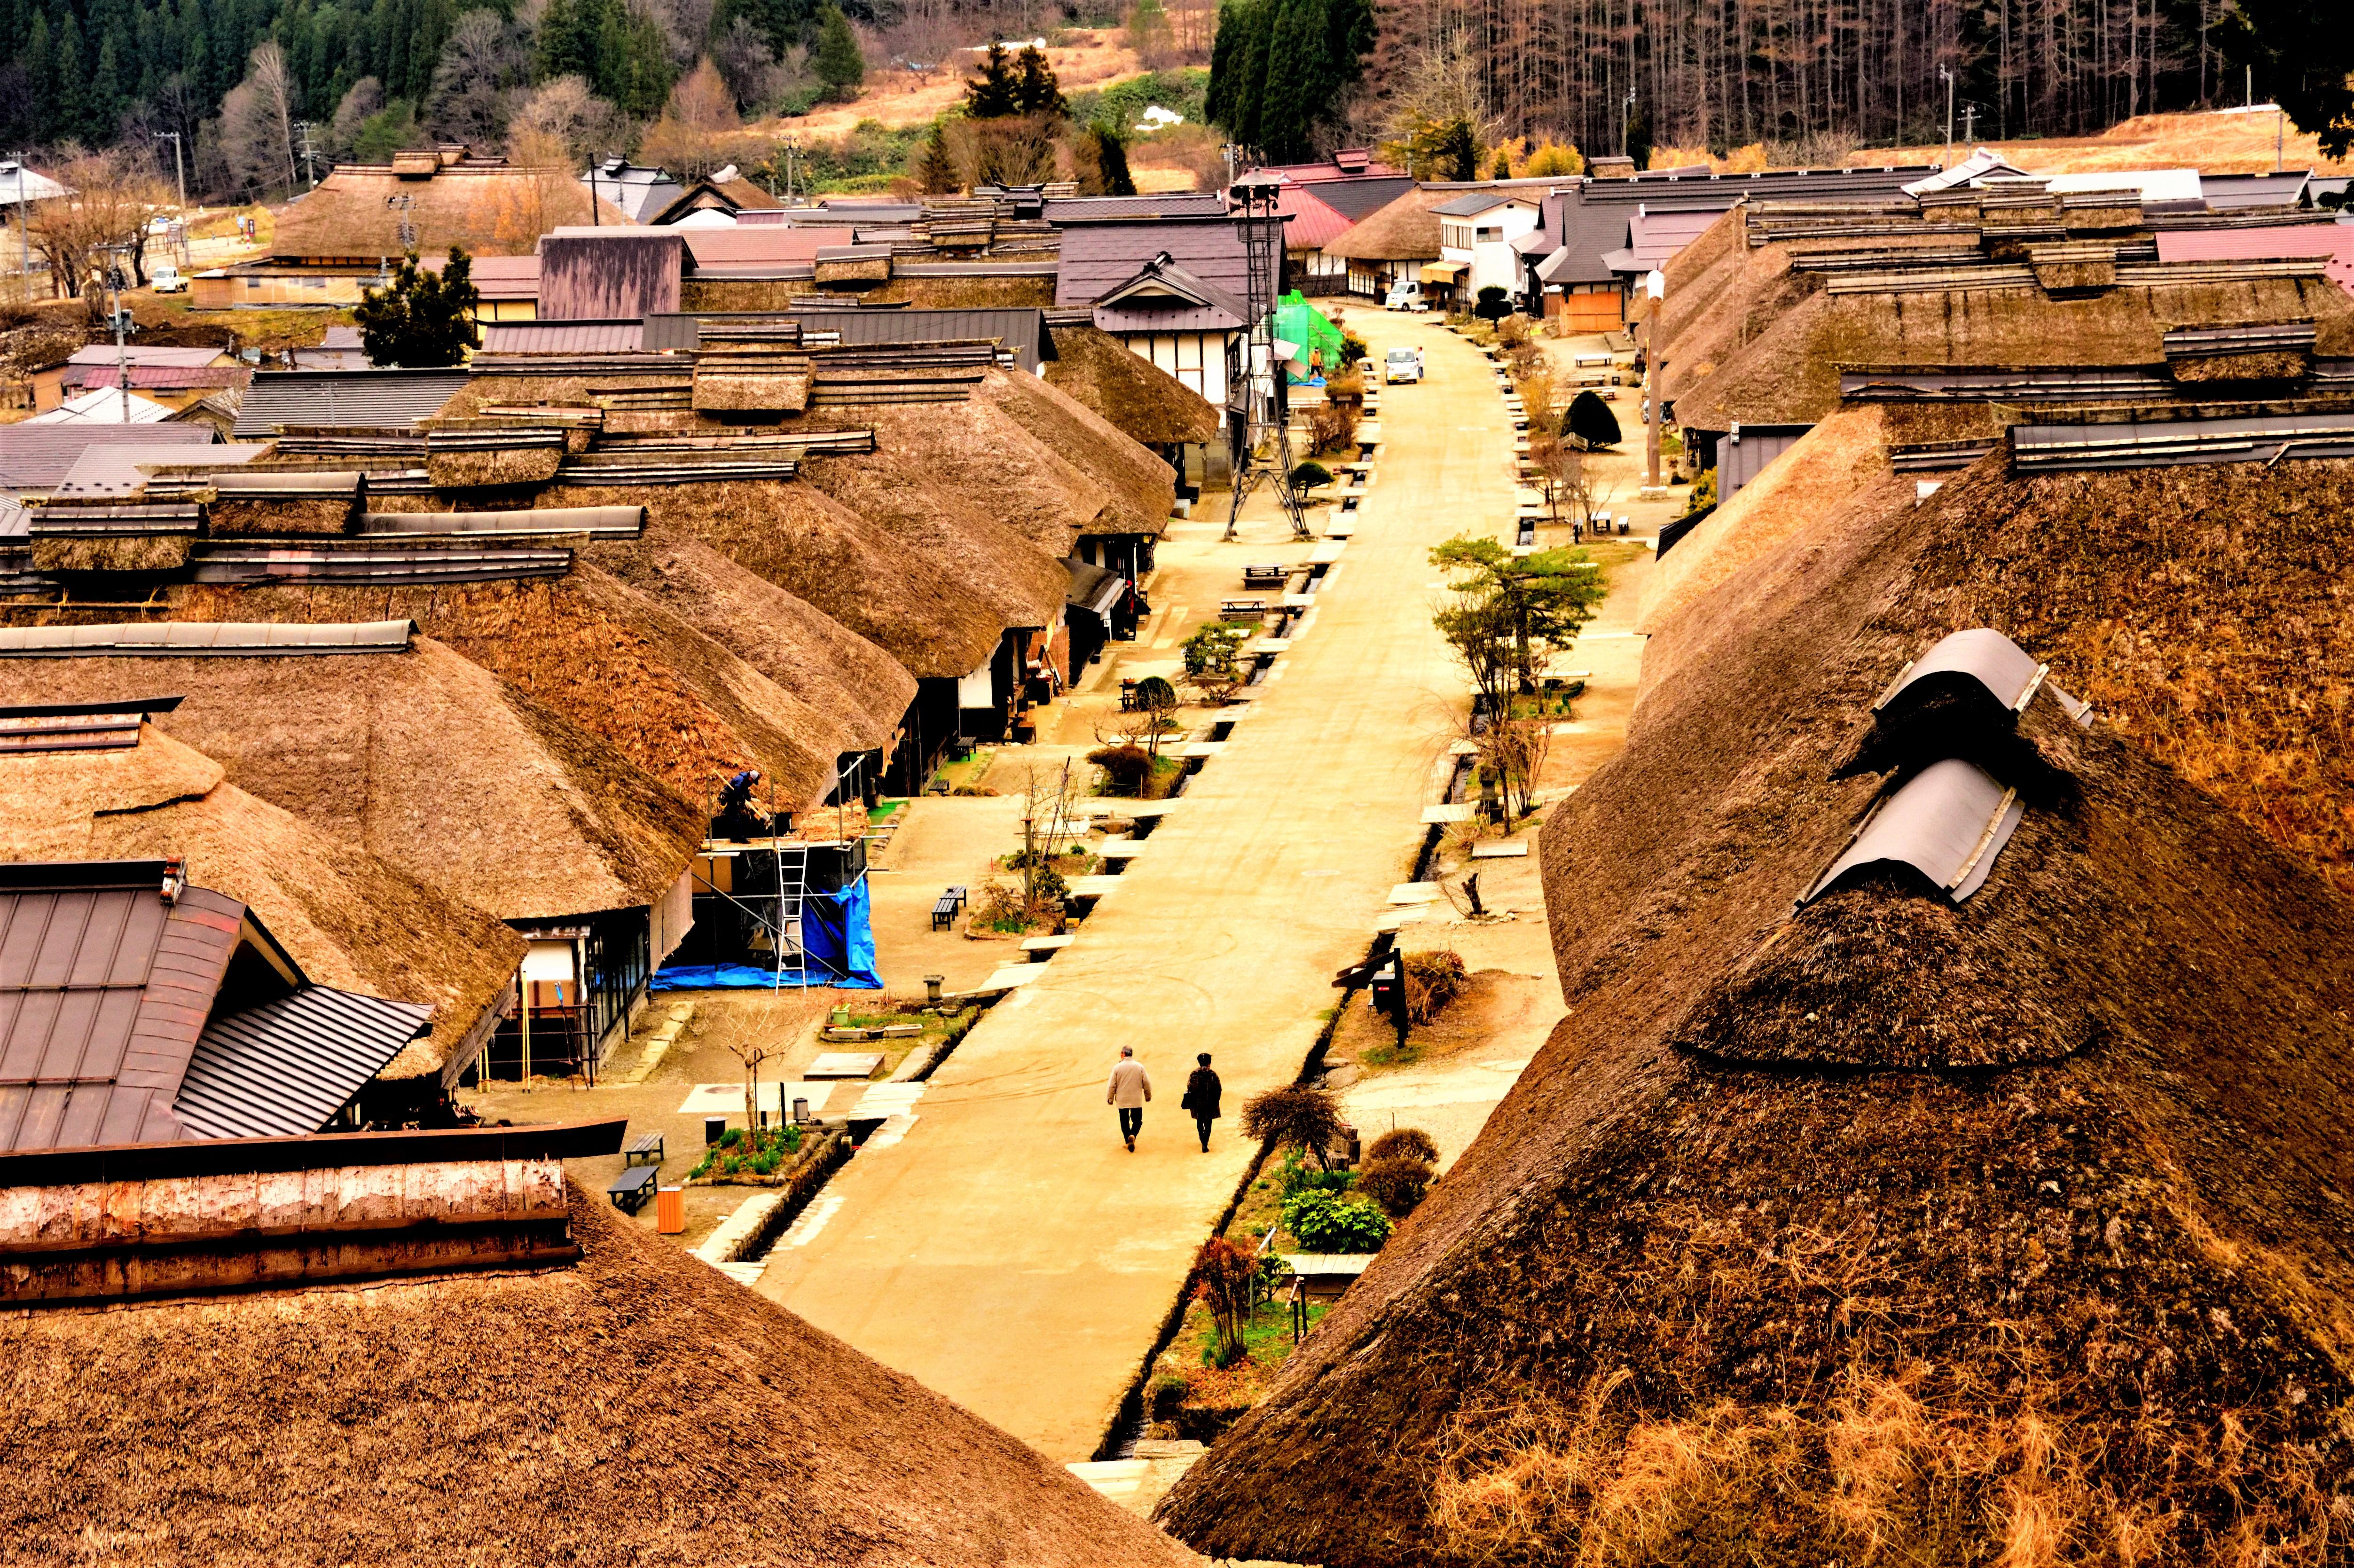 Ouchi-juku town